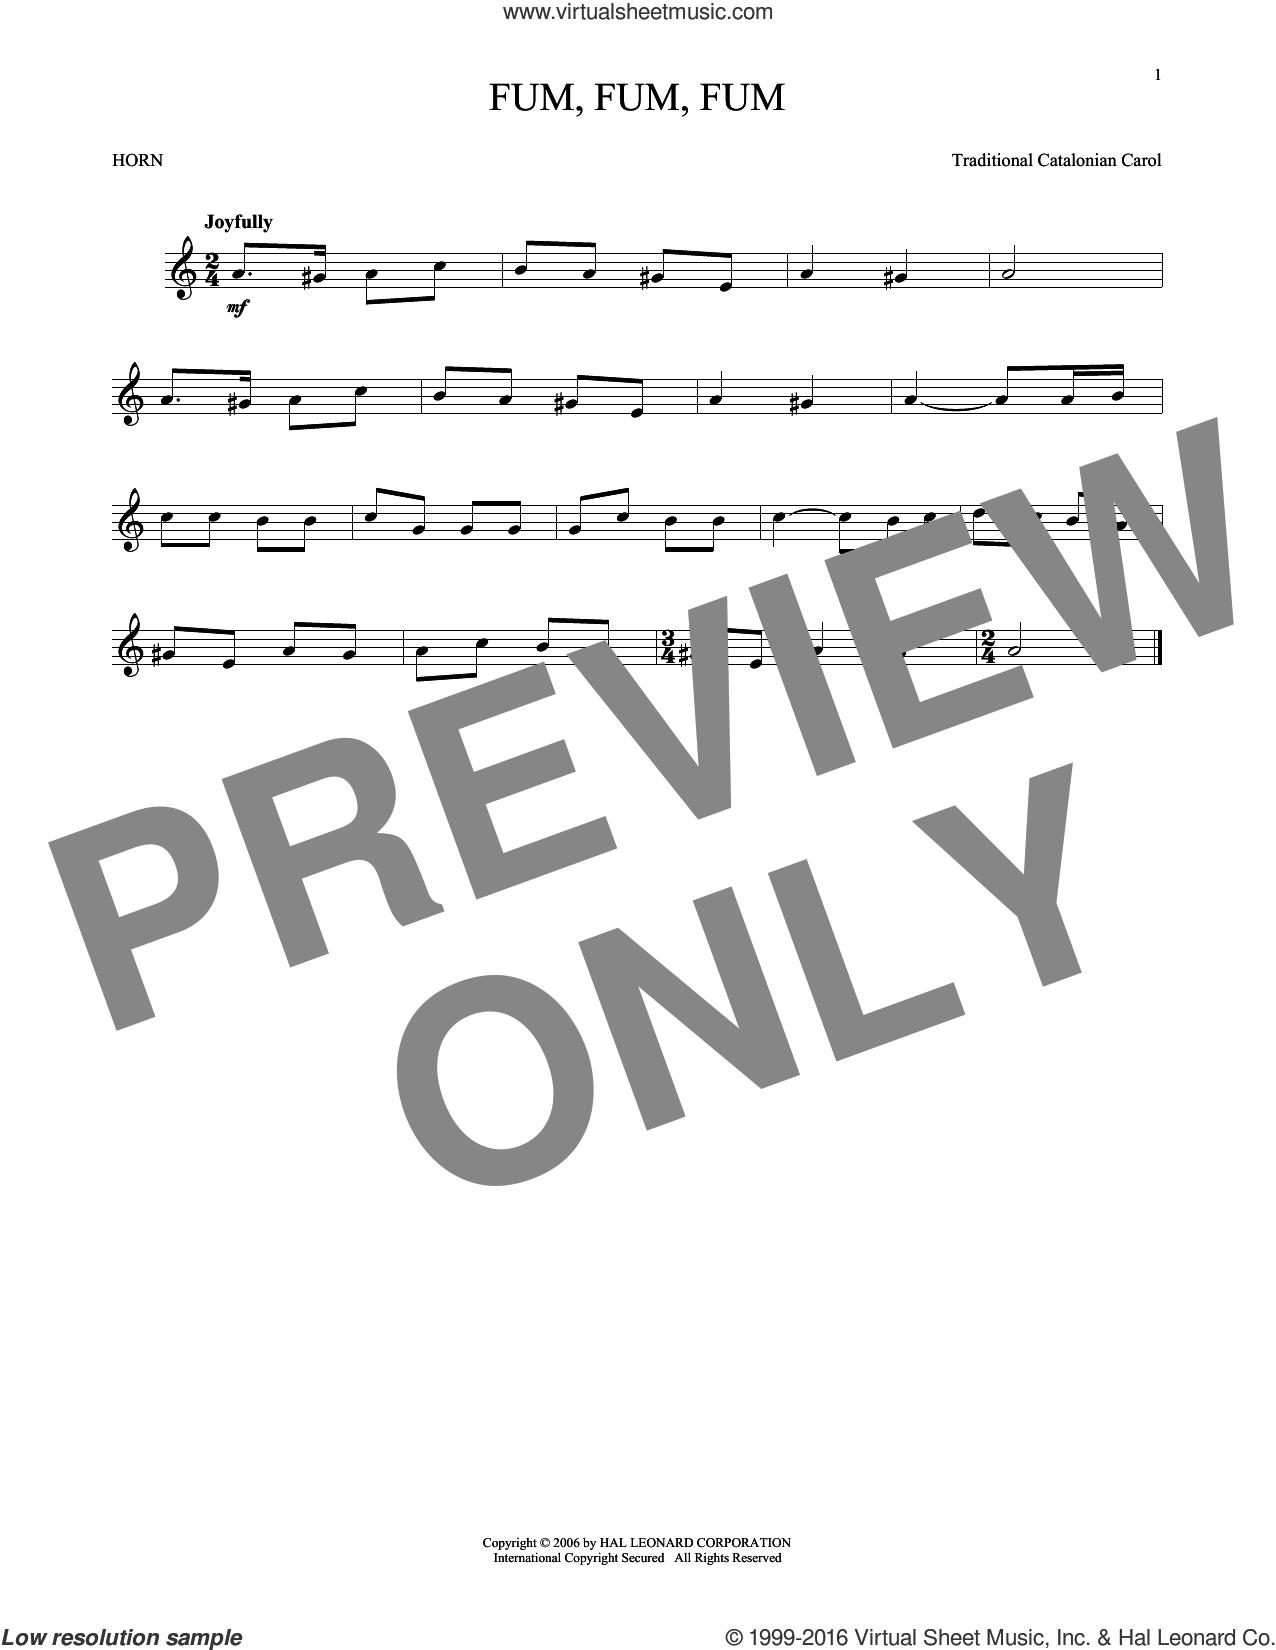 Fum, Fum, Fum sheet music for horn solo, intermediate skill level